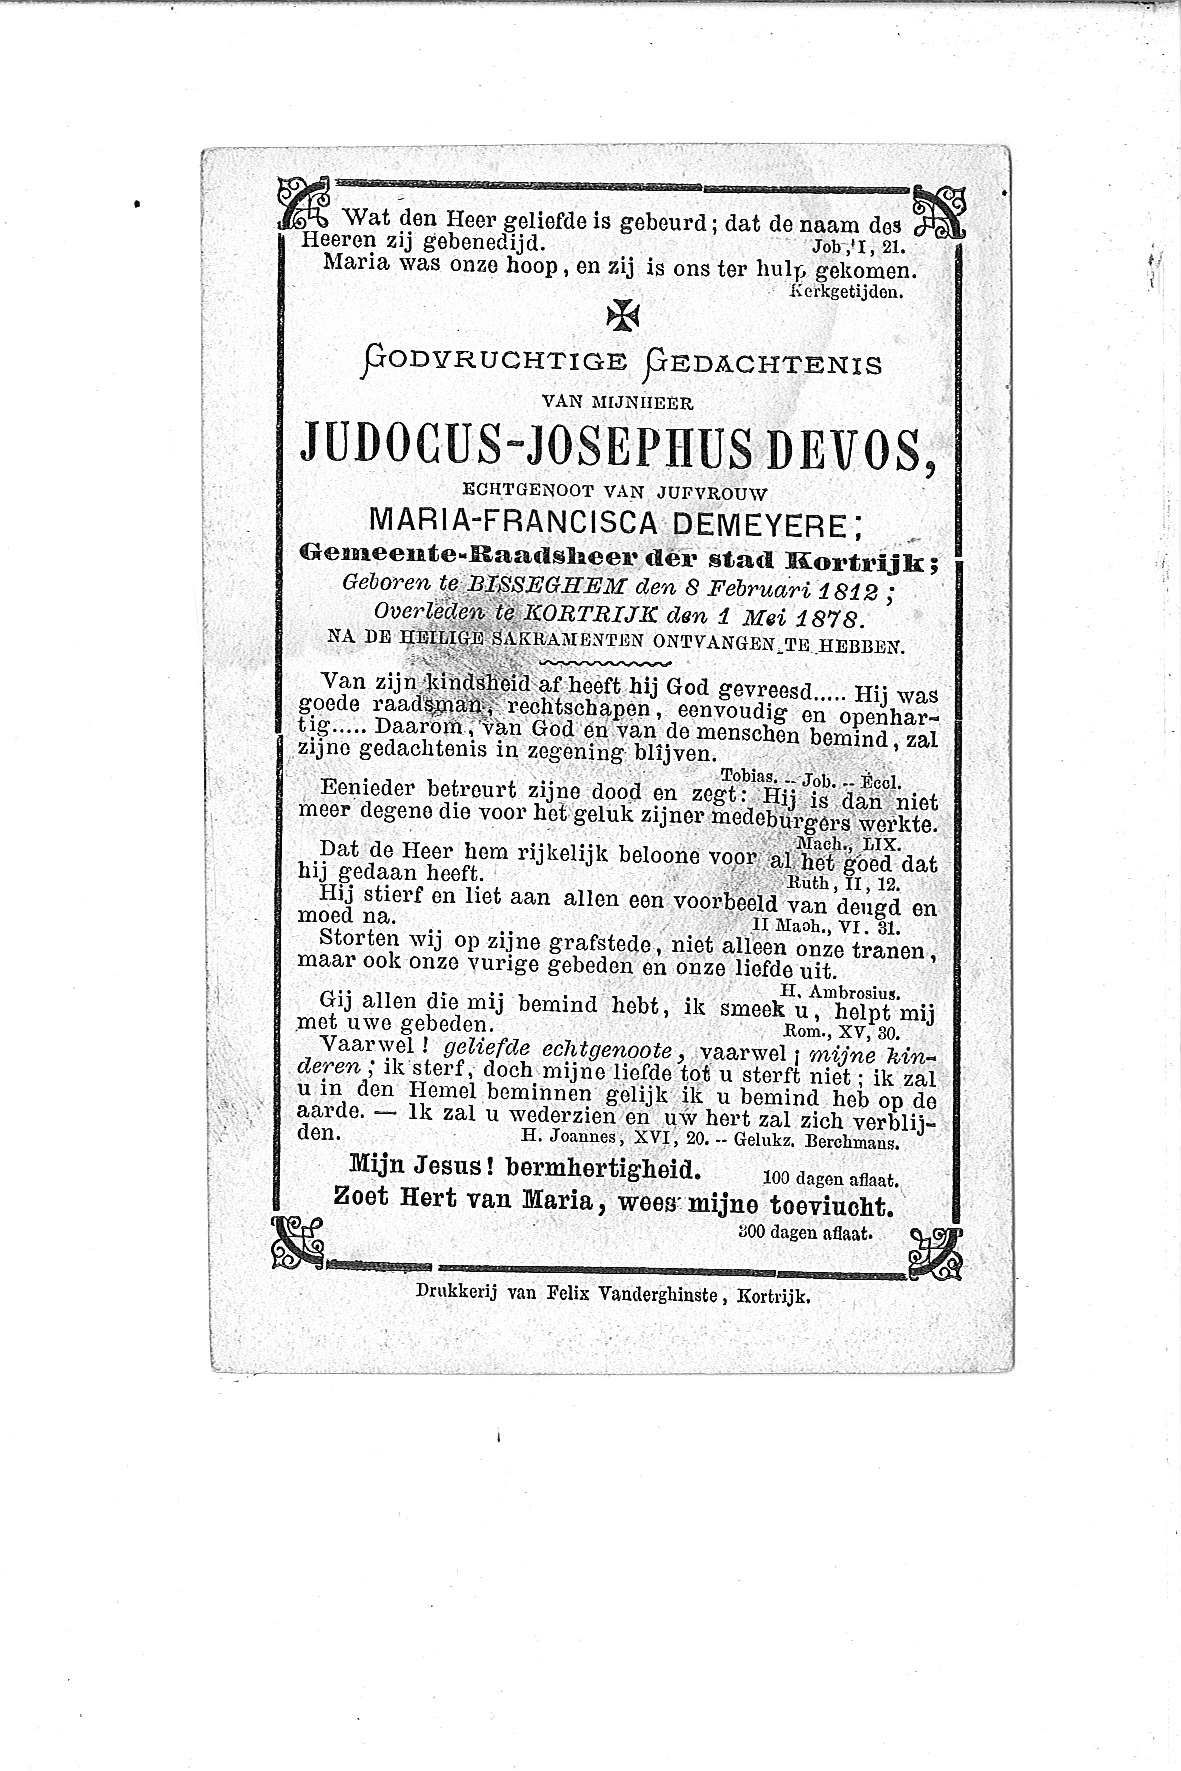 Judocus-Josephus (1878) 20120229094155_00089.jpg